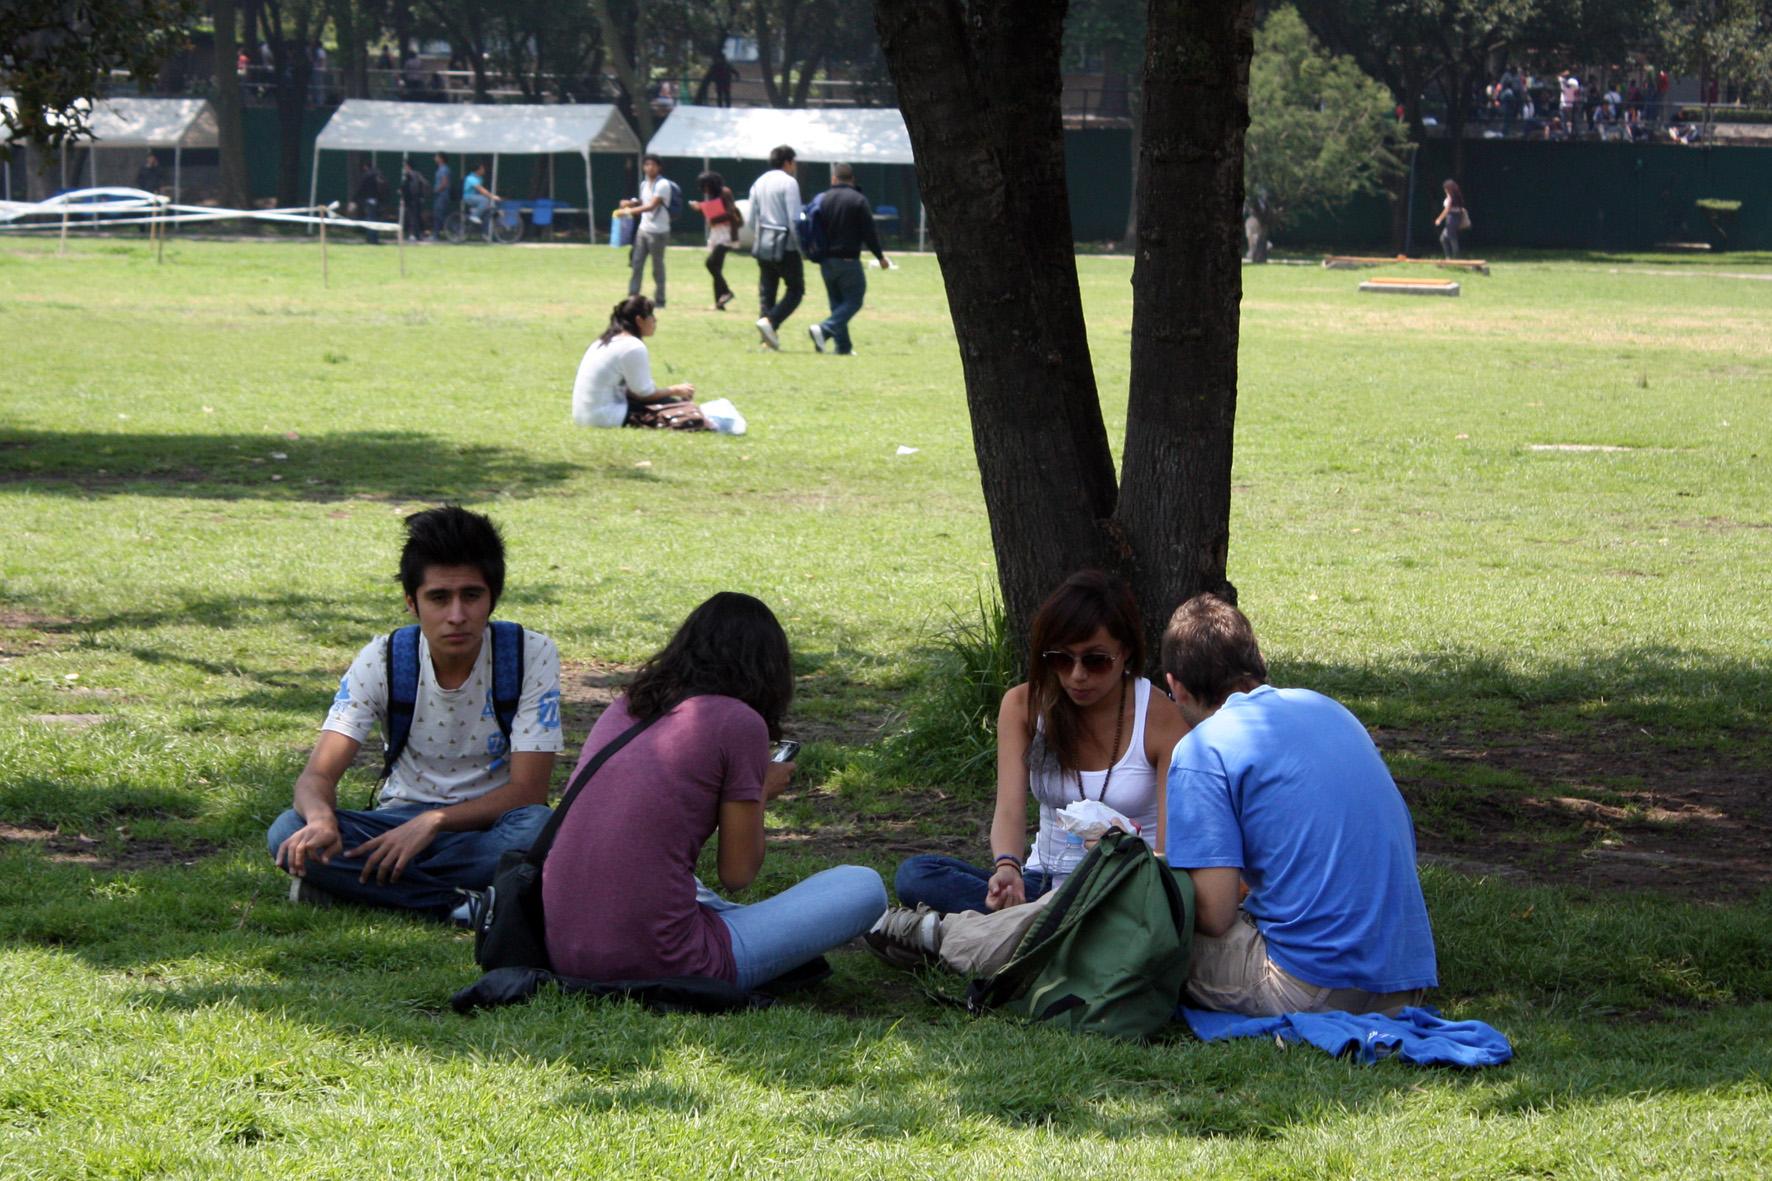 Desempleo-juvenil-aumenta-en-mundo-UNAMGlobal